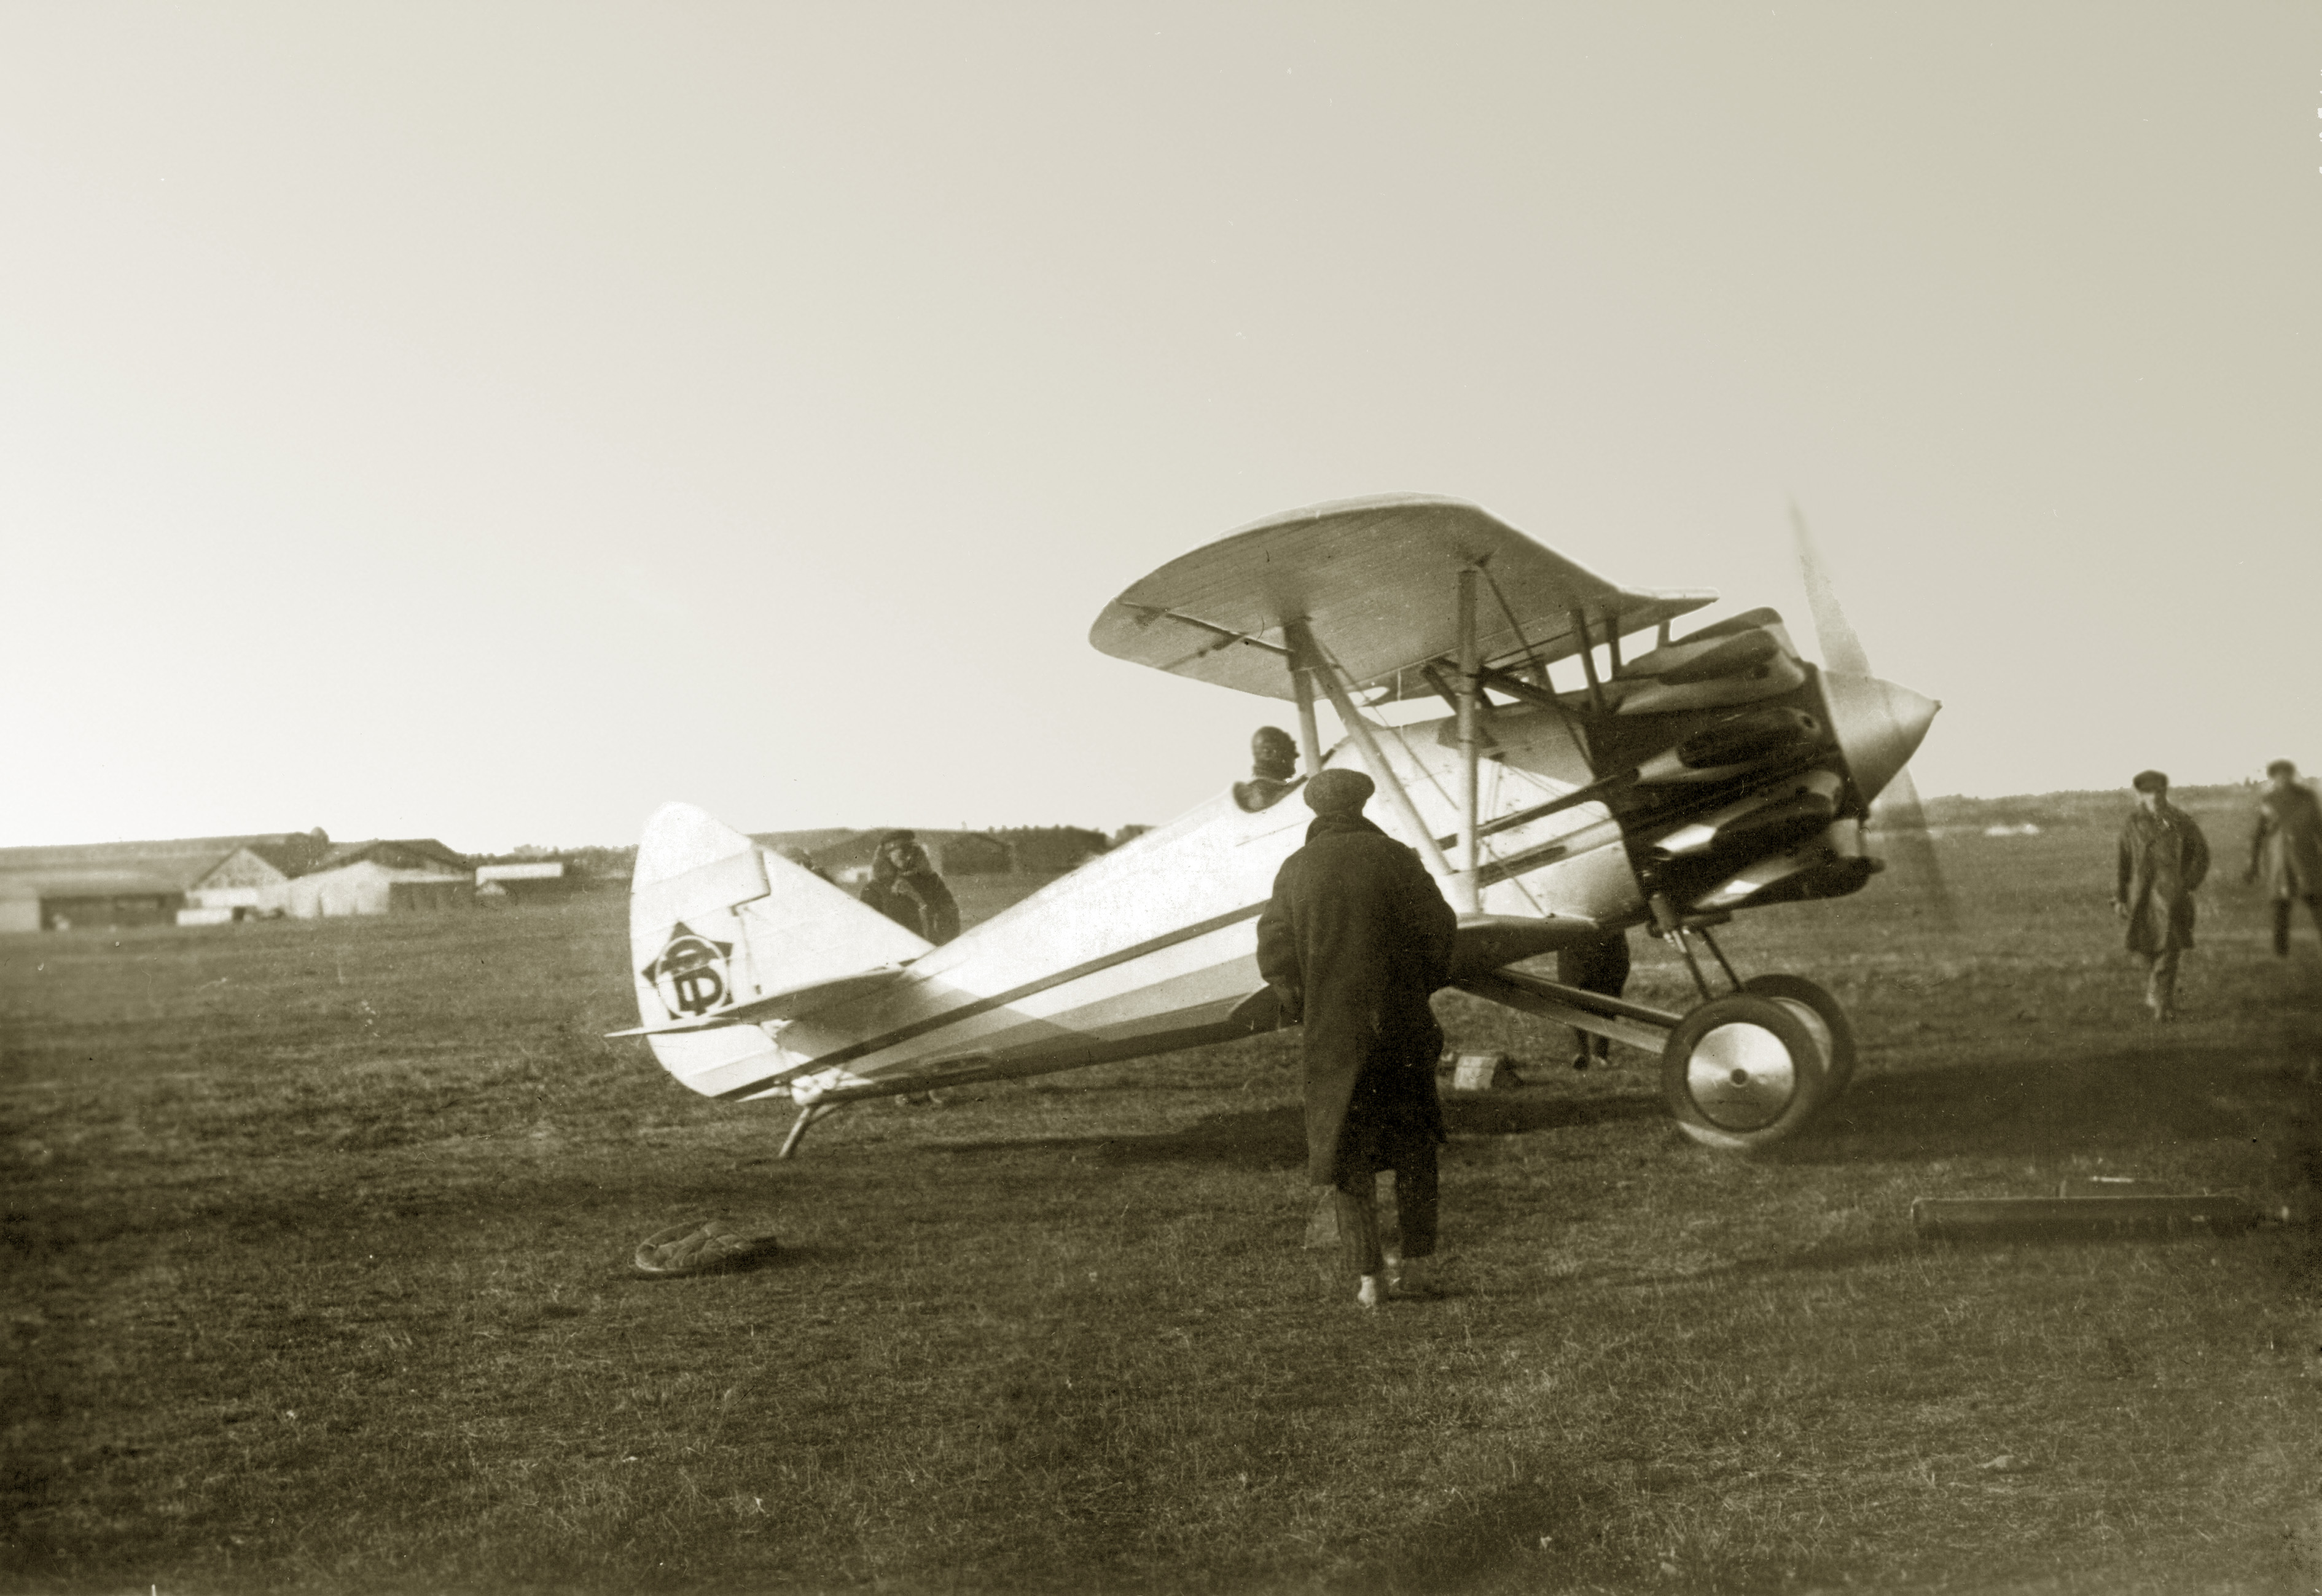 Polikrapov I-5 prototype